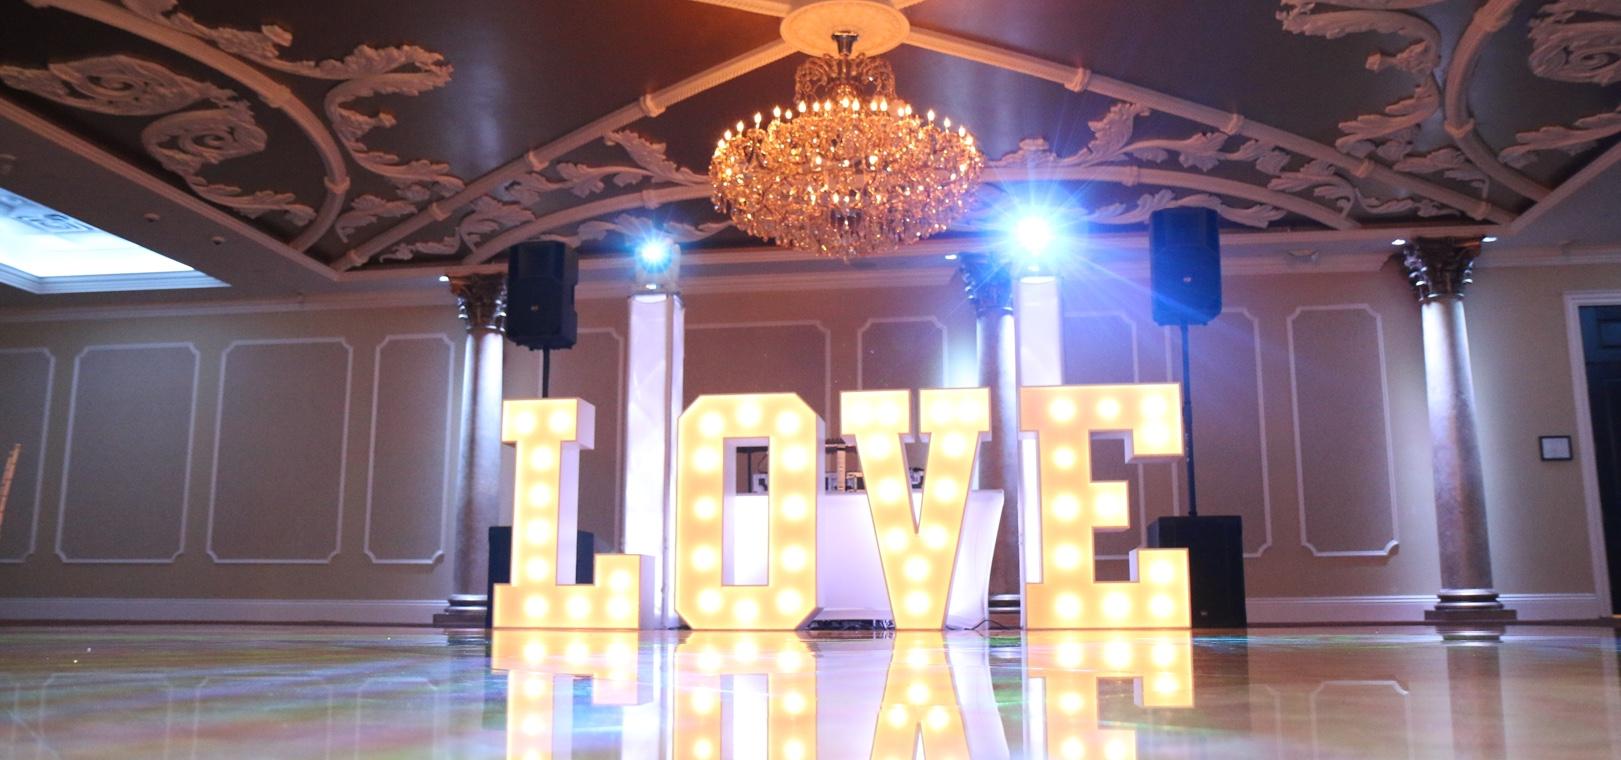 Philly Marquee, Waterfall Delaware, Delaware Weddings, Intelligent Lighting